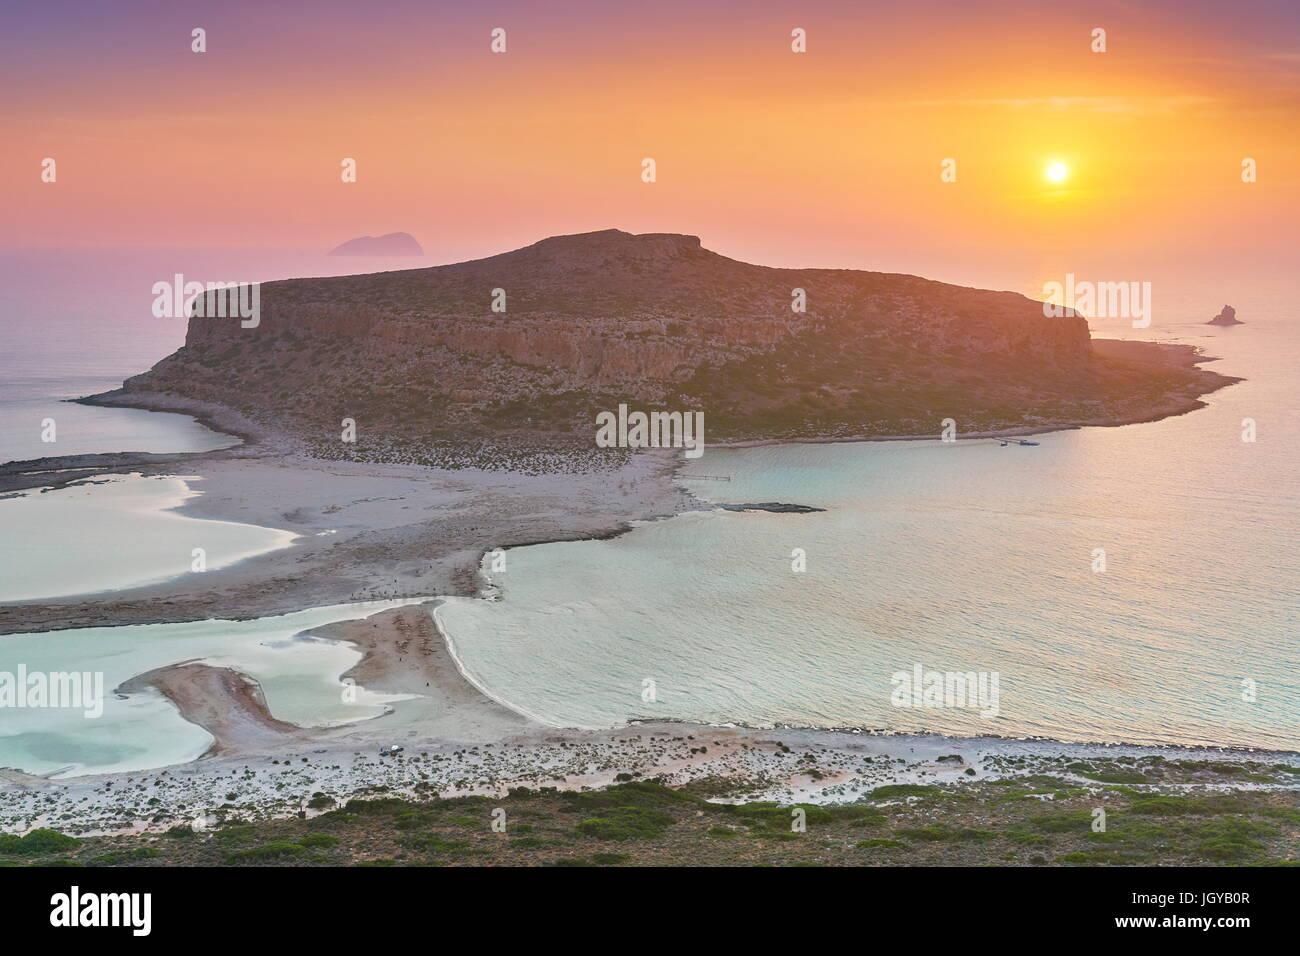 Sonnenuntergang am Balos Beach, Insel Kreta, Griechenland Stockfoto